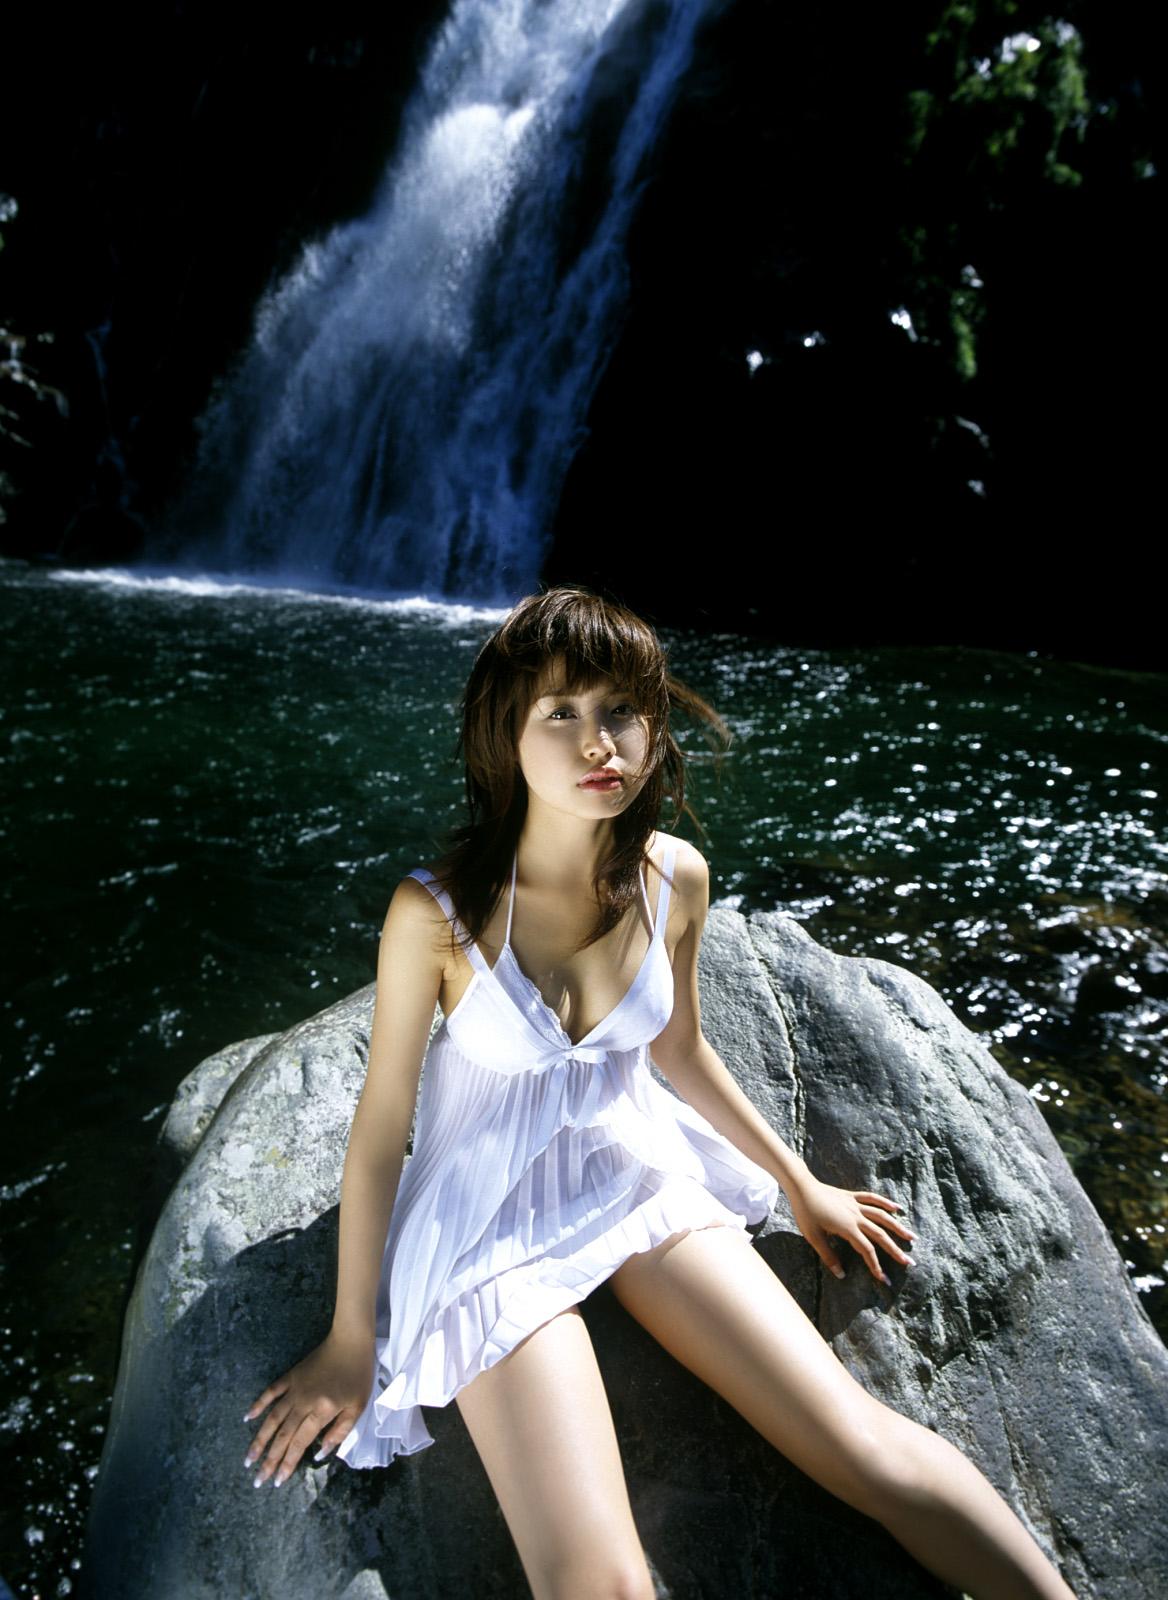 Megumi Fukushita ~ Japan girls - Bikini girls - Sexy girls